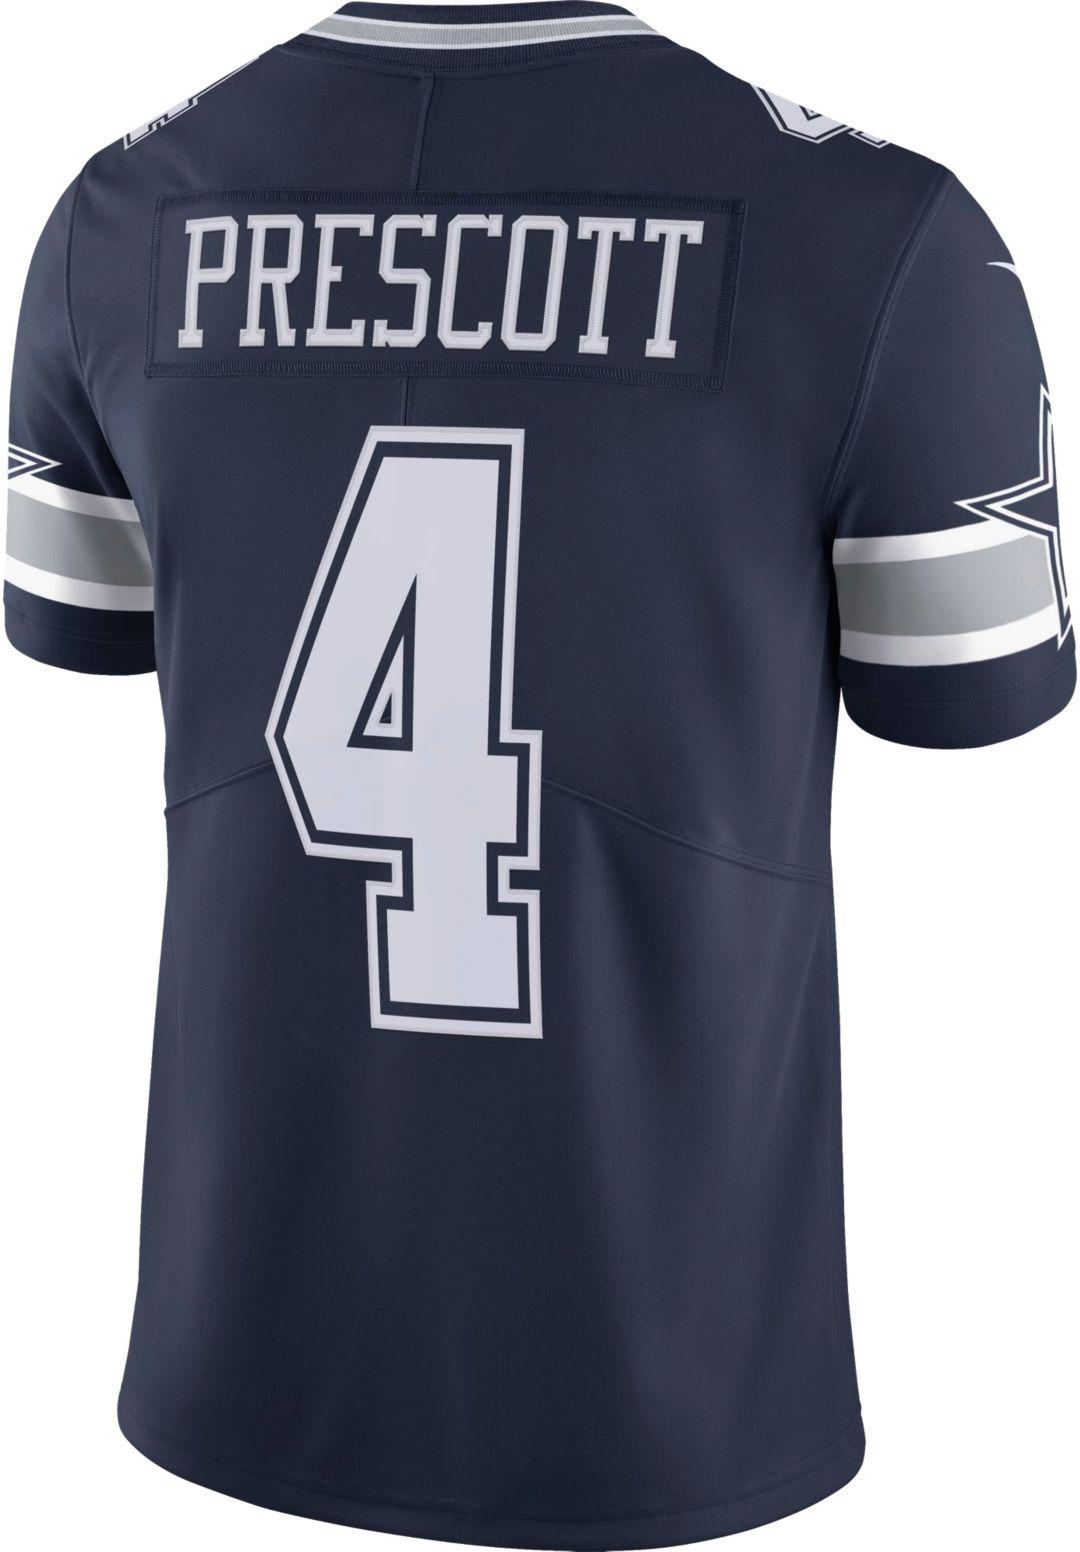 buy popular cac3f da055 Nike Men's Limited Jersey Dallas Cowboys Dak Prescott #4